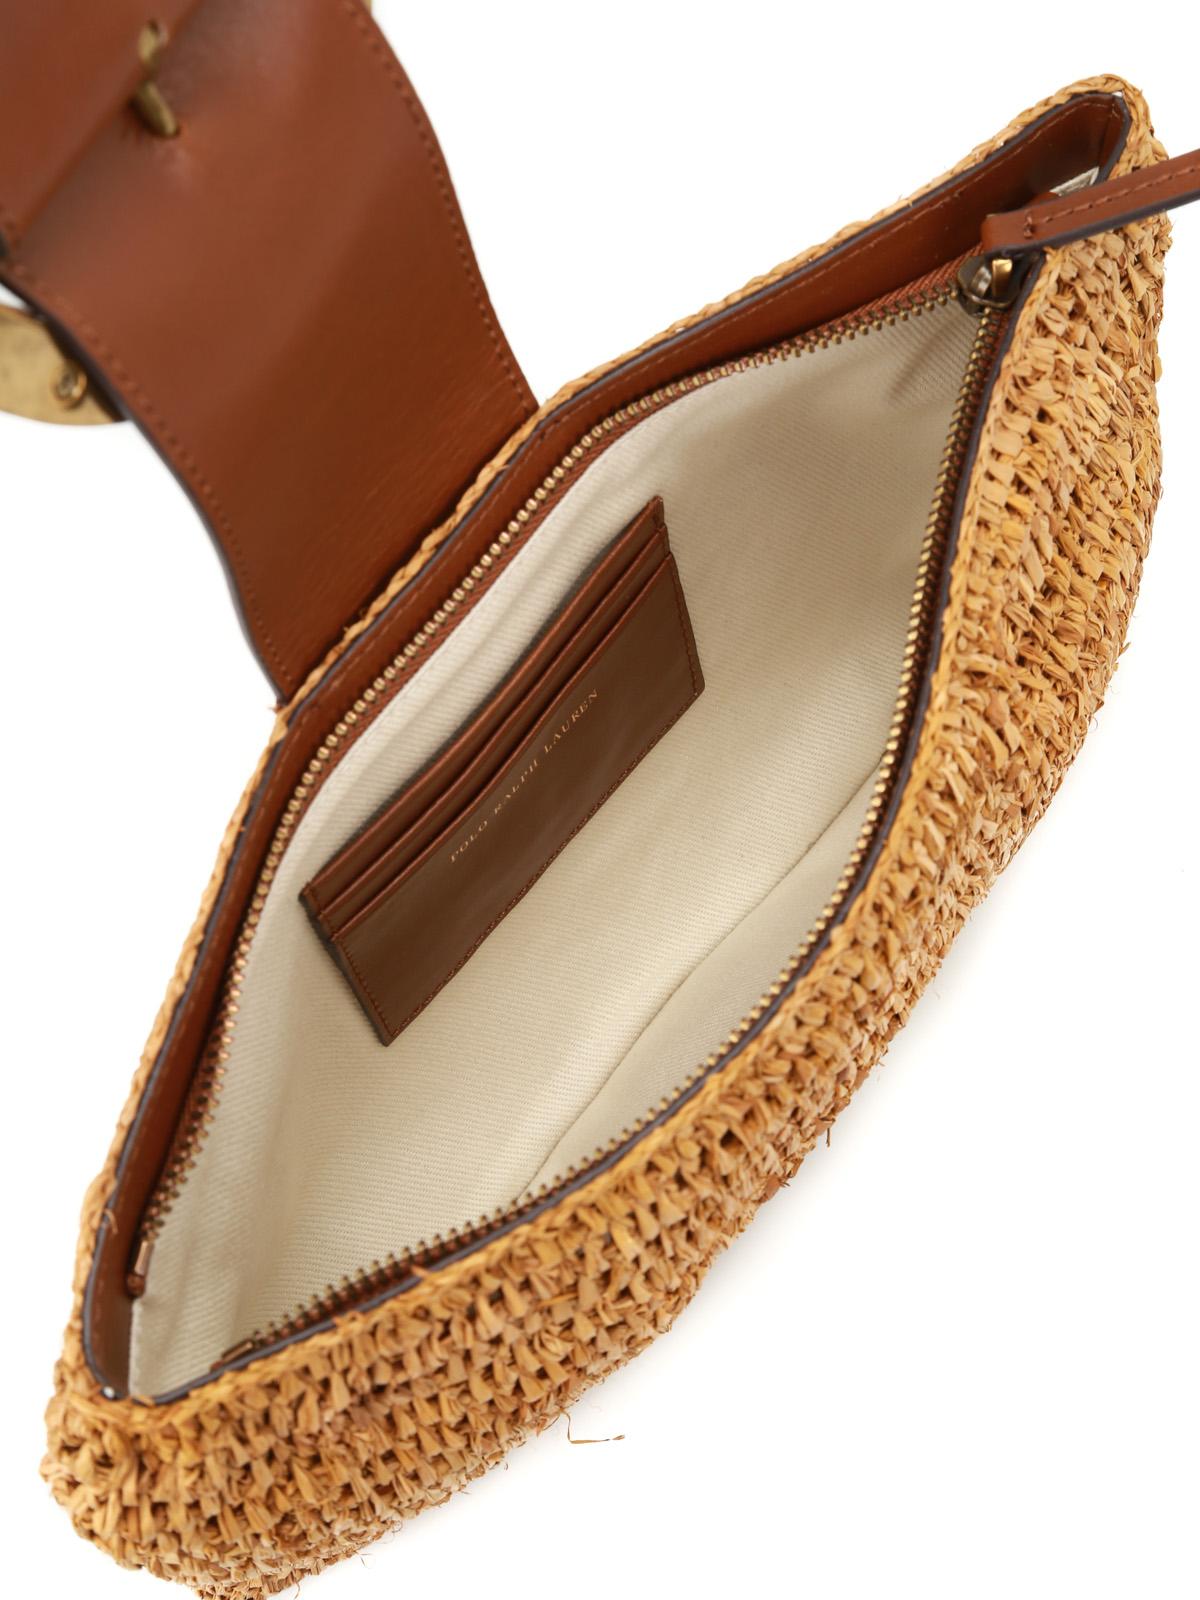 Polo Ralph Lauren buy online Lennox small natural raffia clutch